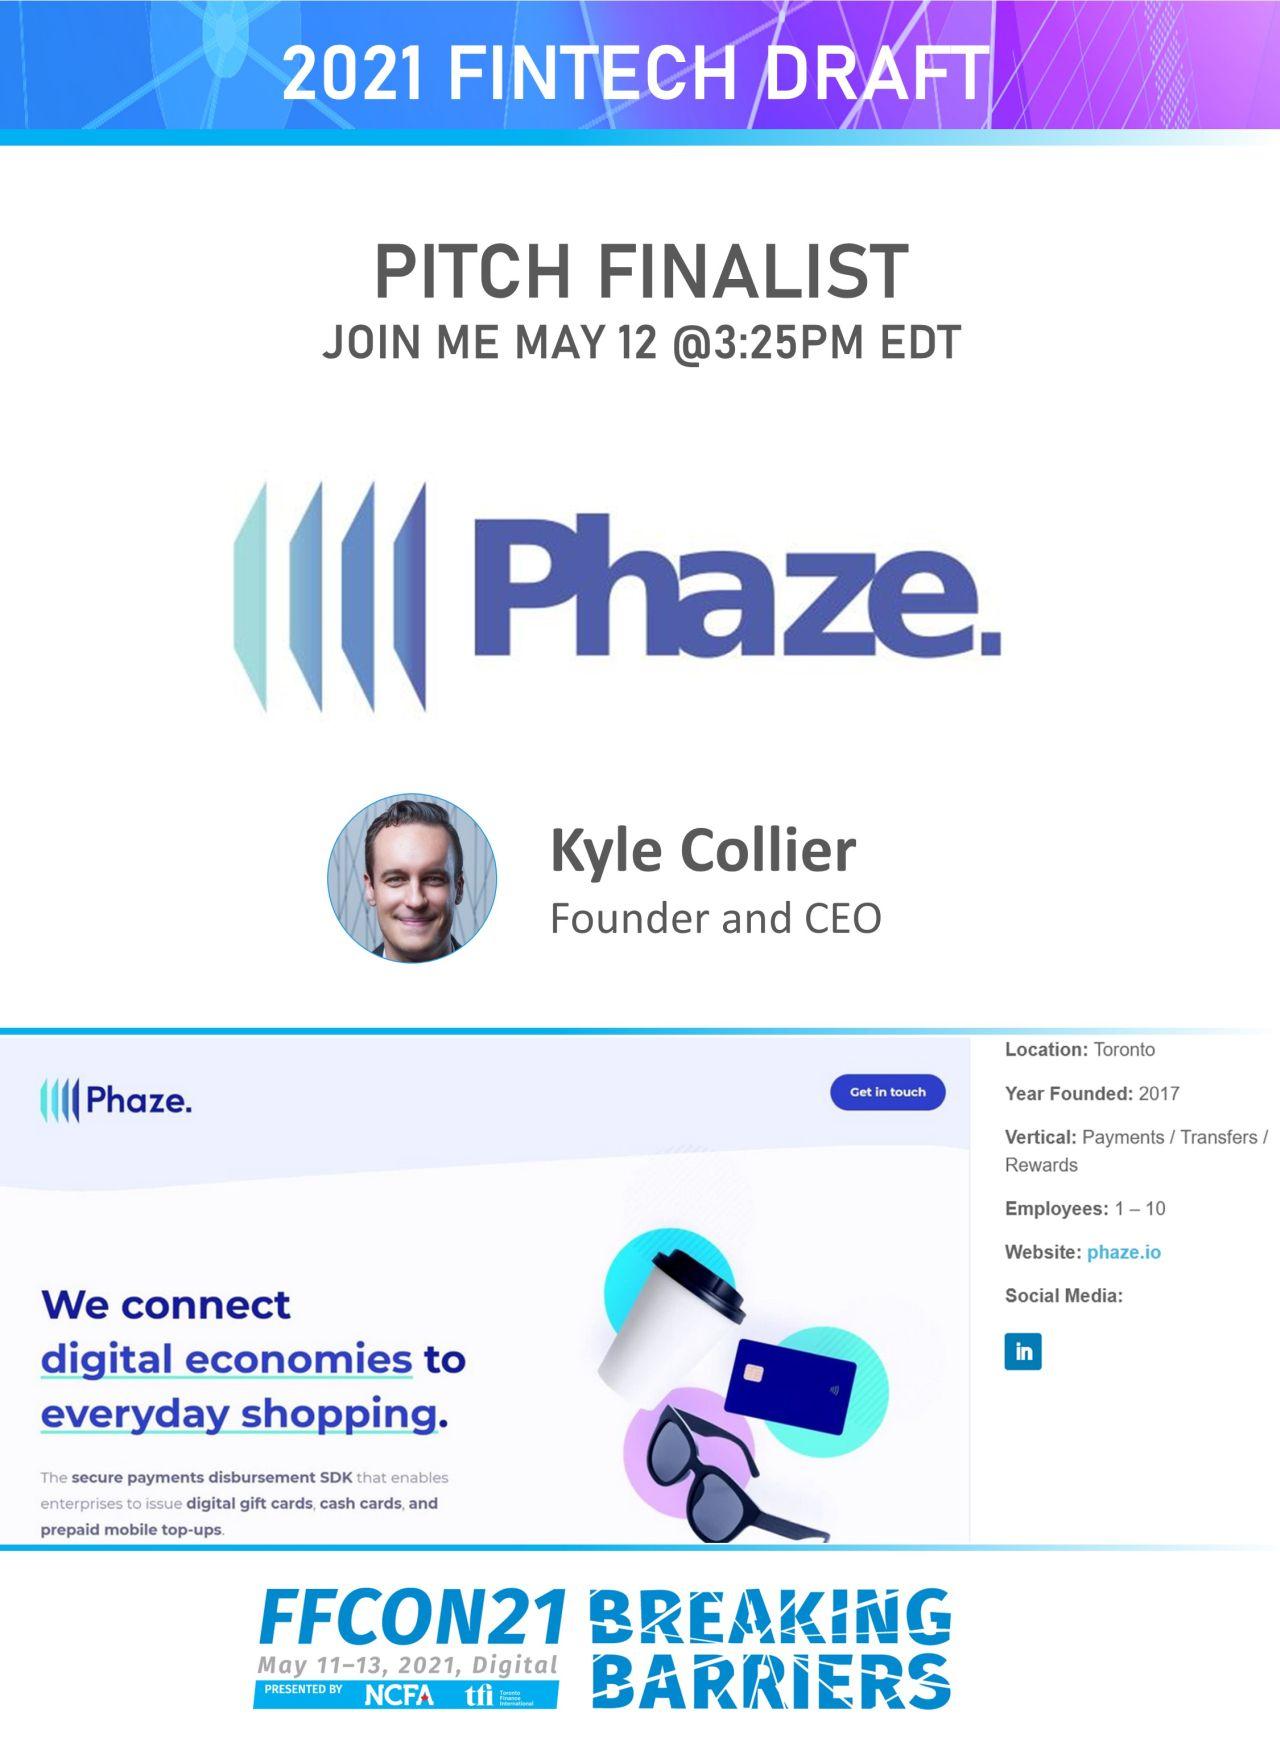 FFCON21 Pitch Finalist Phaze